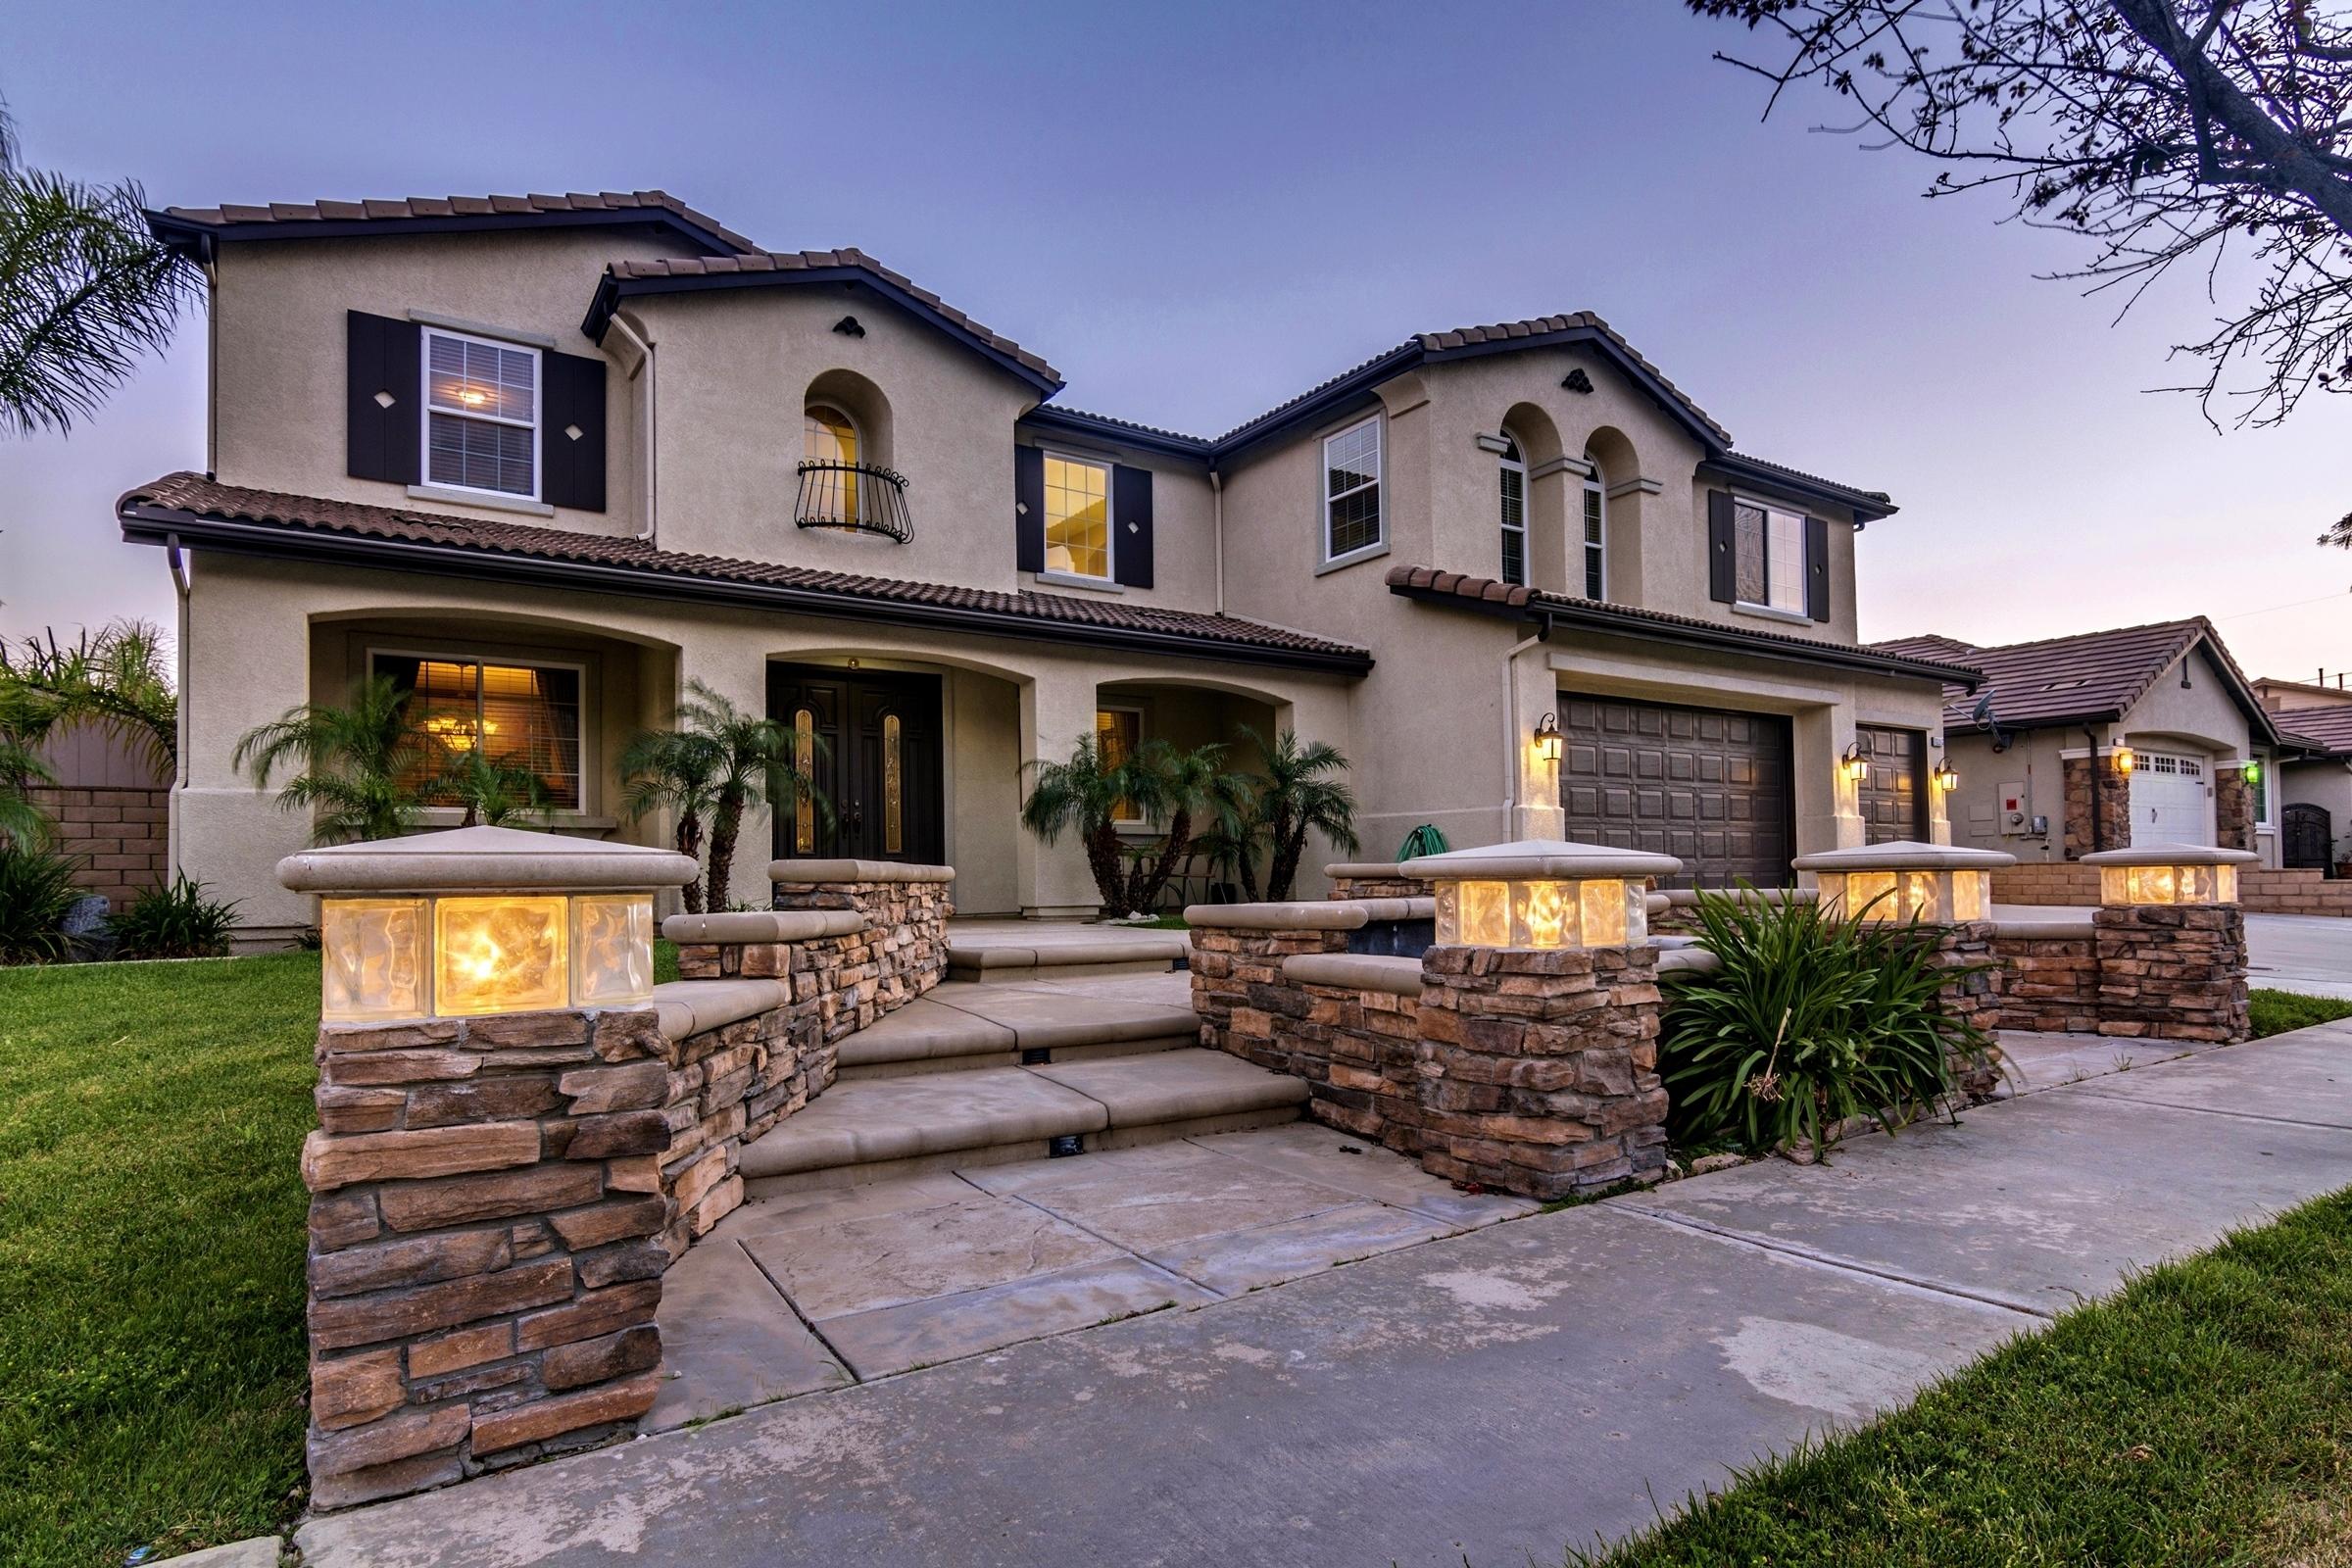 New Homes In Rancho Cucamonga Near Victoria Gardens